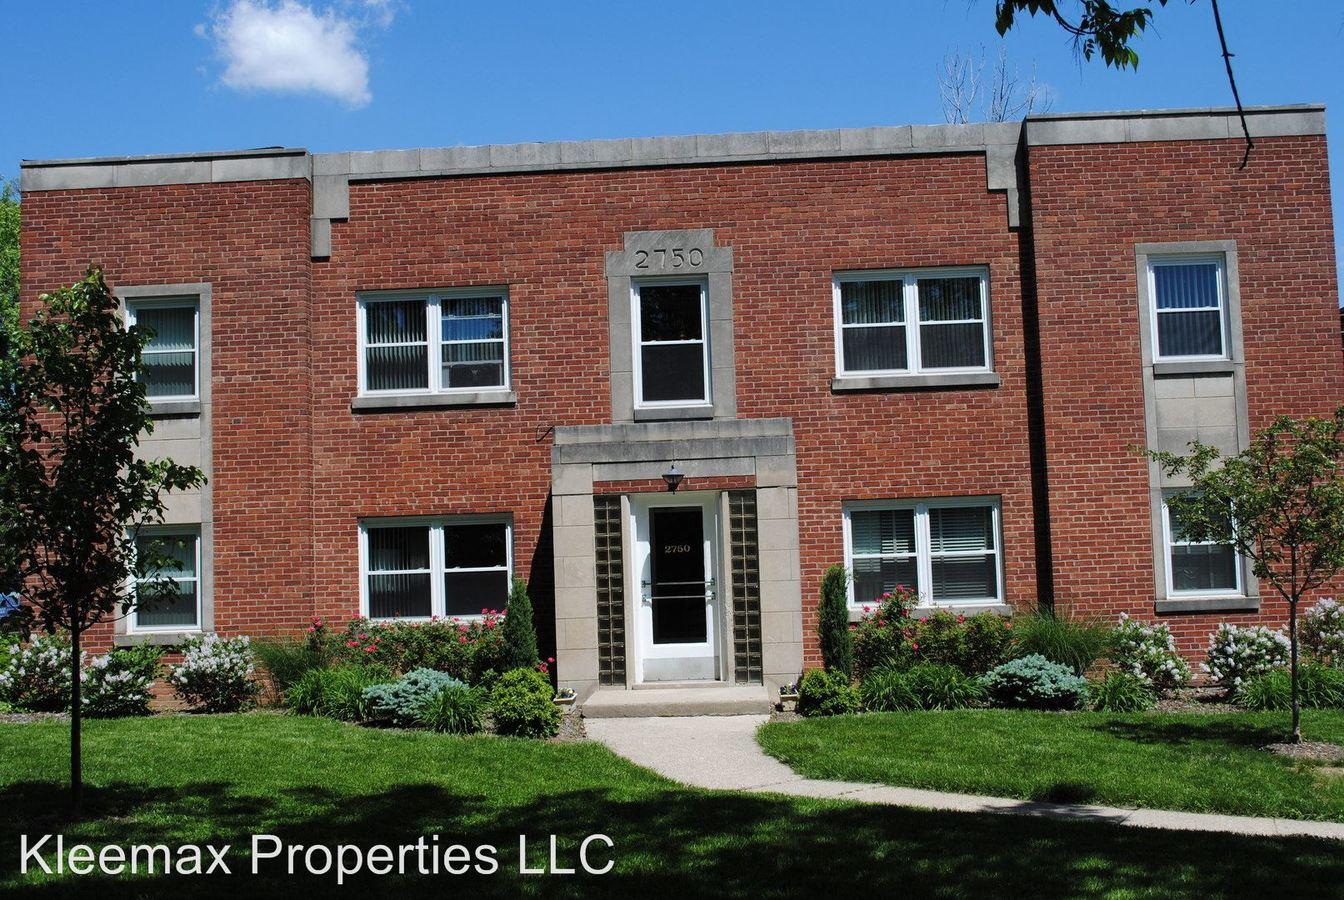 1 Bedroom 1 Bathroom Apartment for rent at 2750 Linshaw Ct in Cincinnati, OH